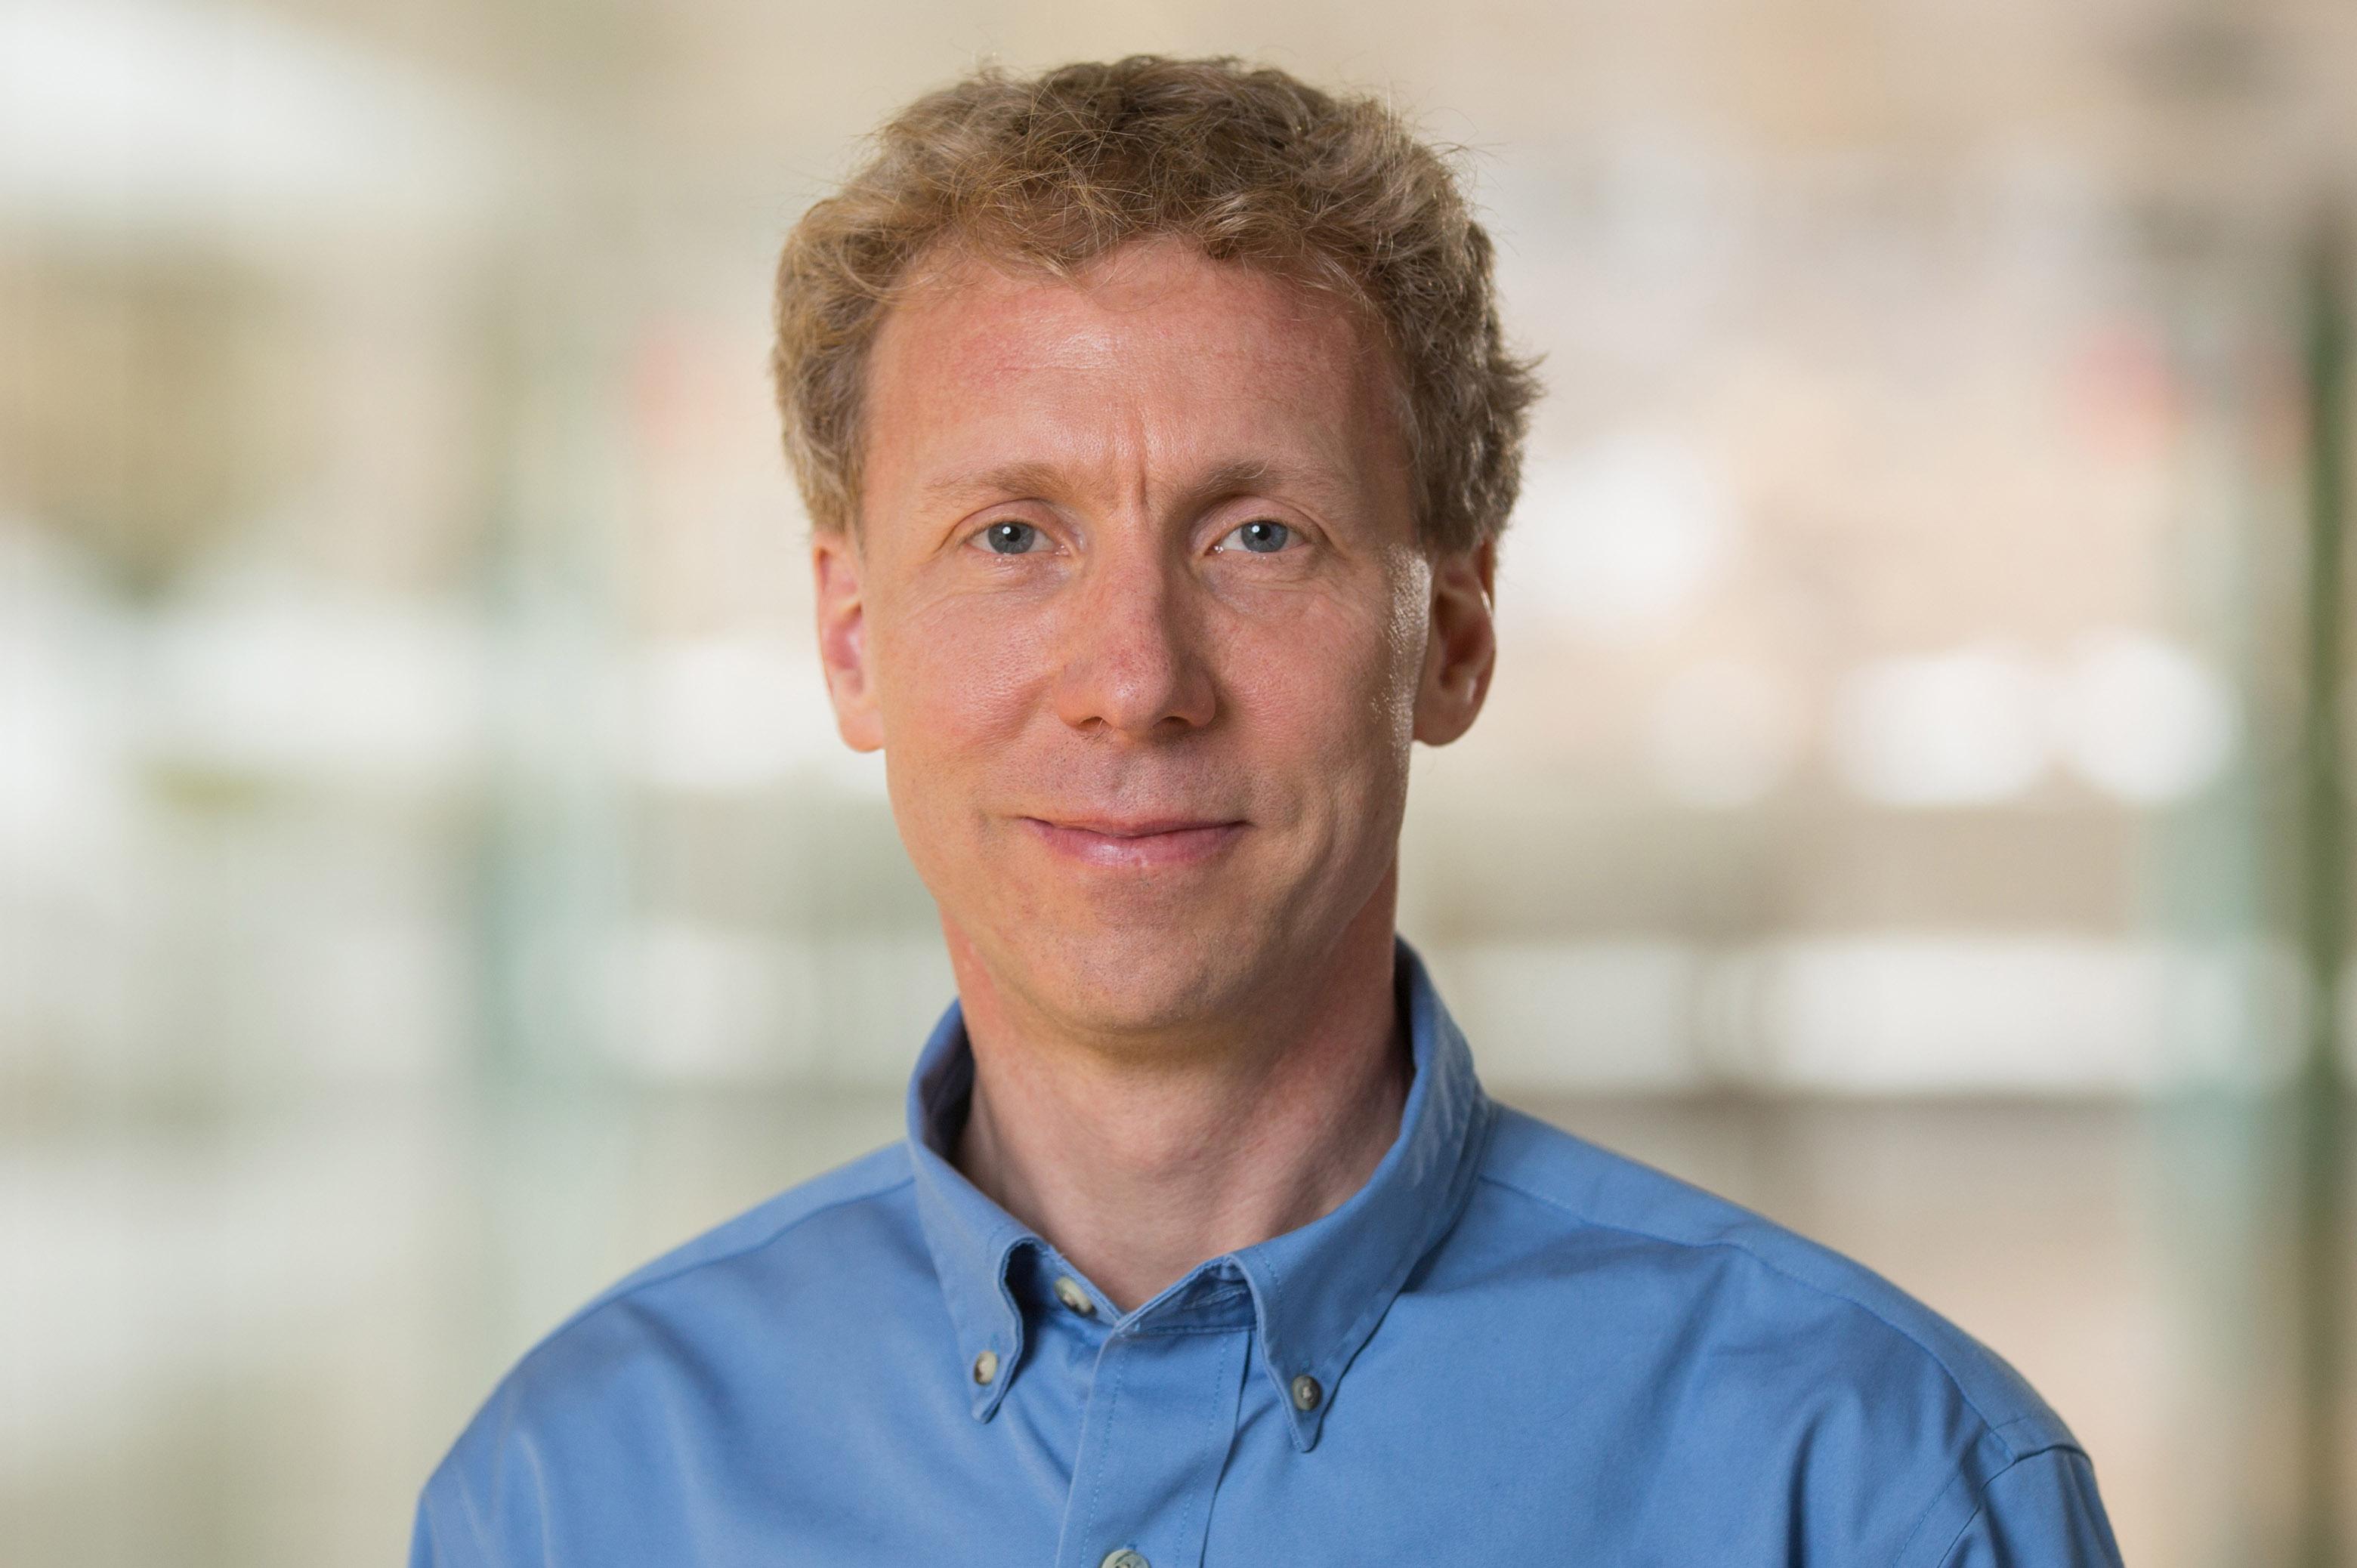 David Blaauw